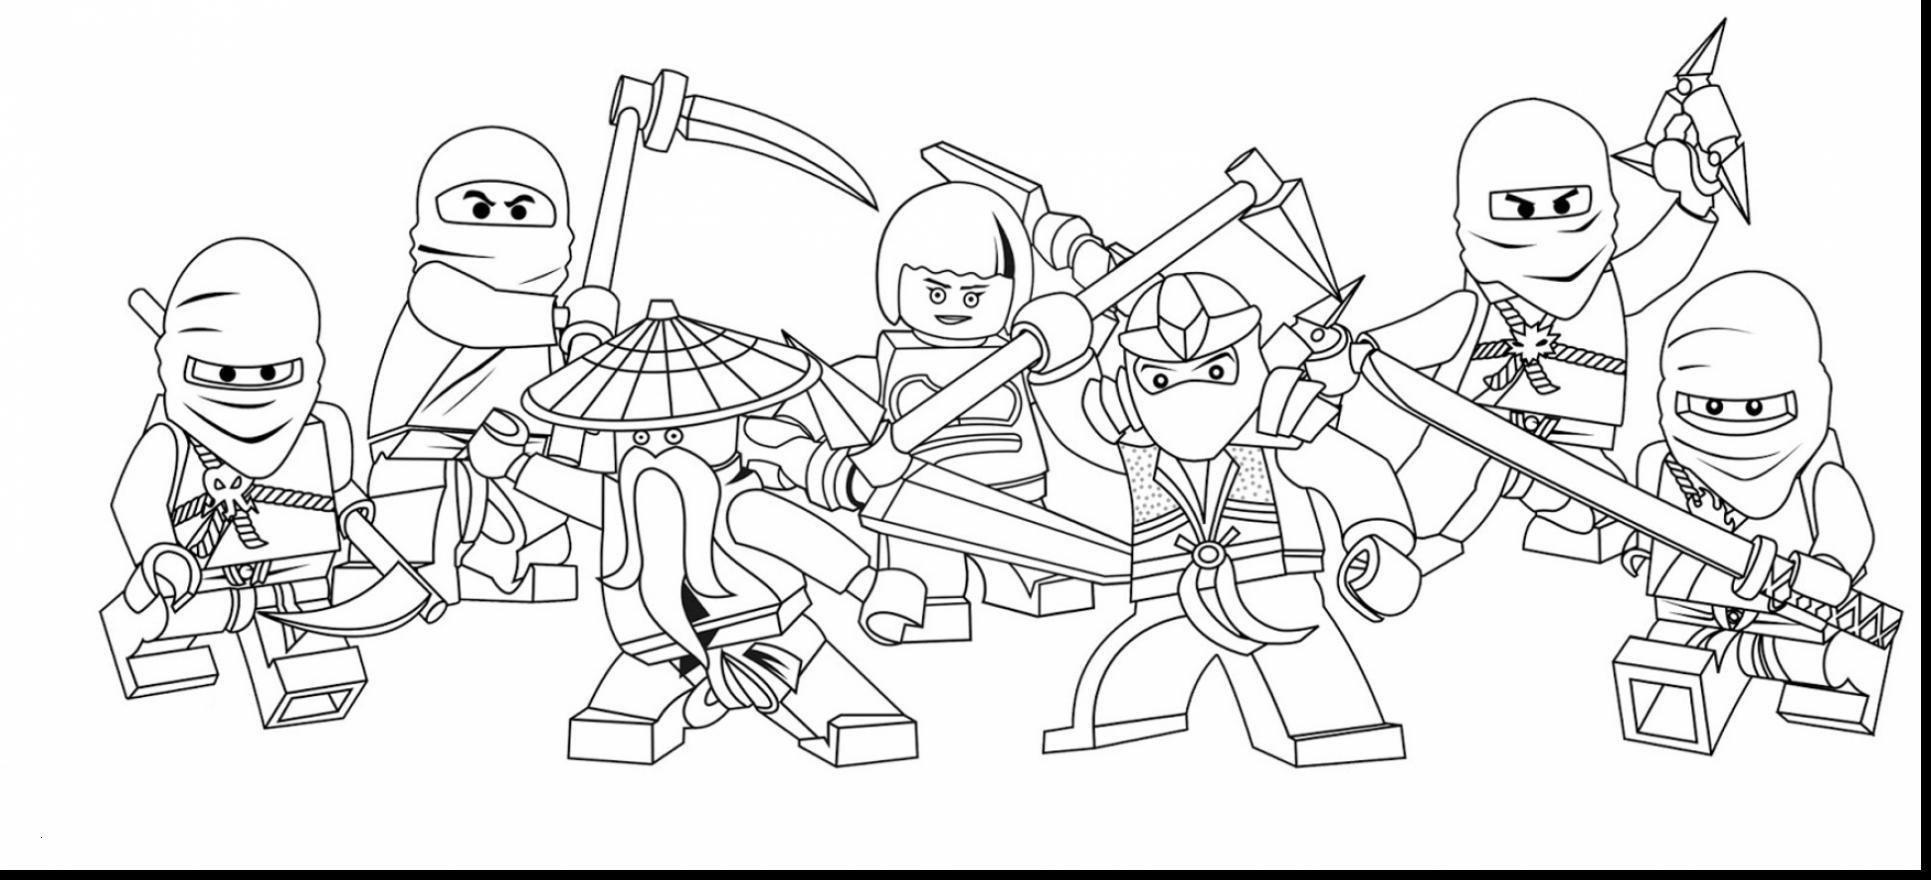 Lego Ninjago Zum Ausmalen Einzigartig Ausmalbilder Lego Ninjago Kai Uploadertalk Schön Lego Ninjago Sammlung